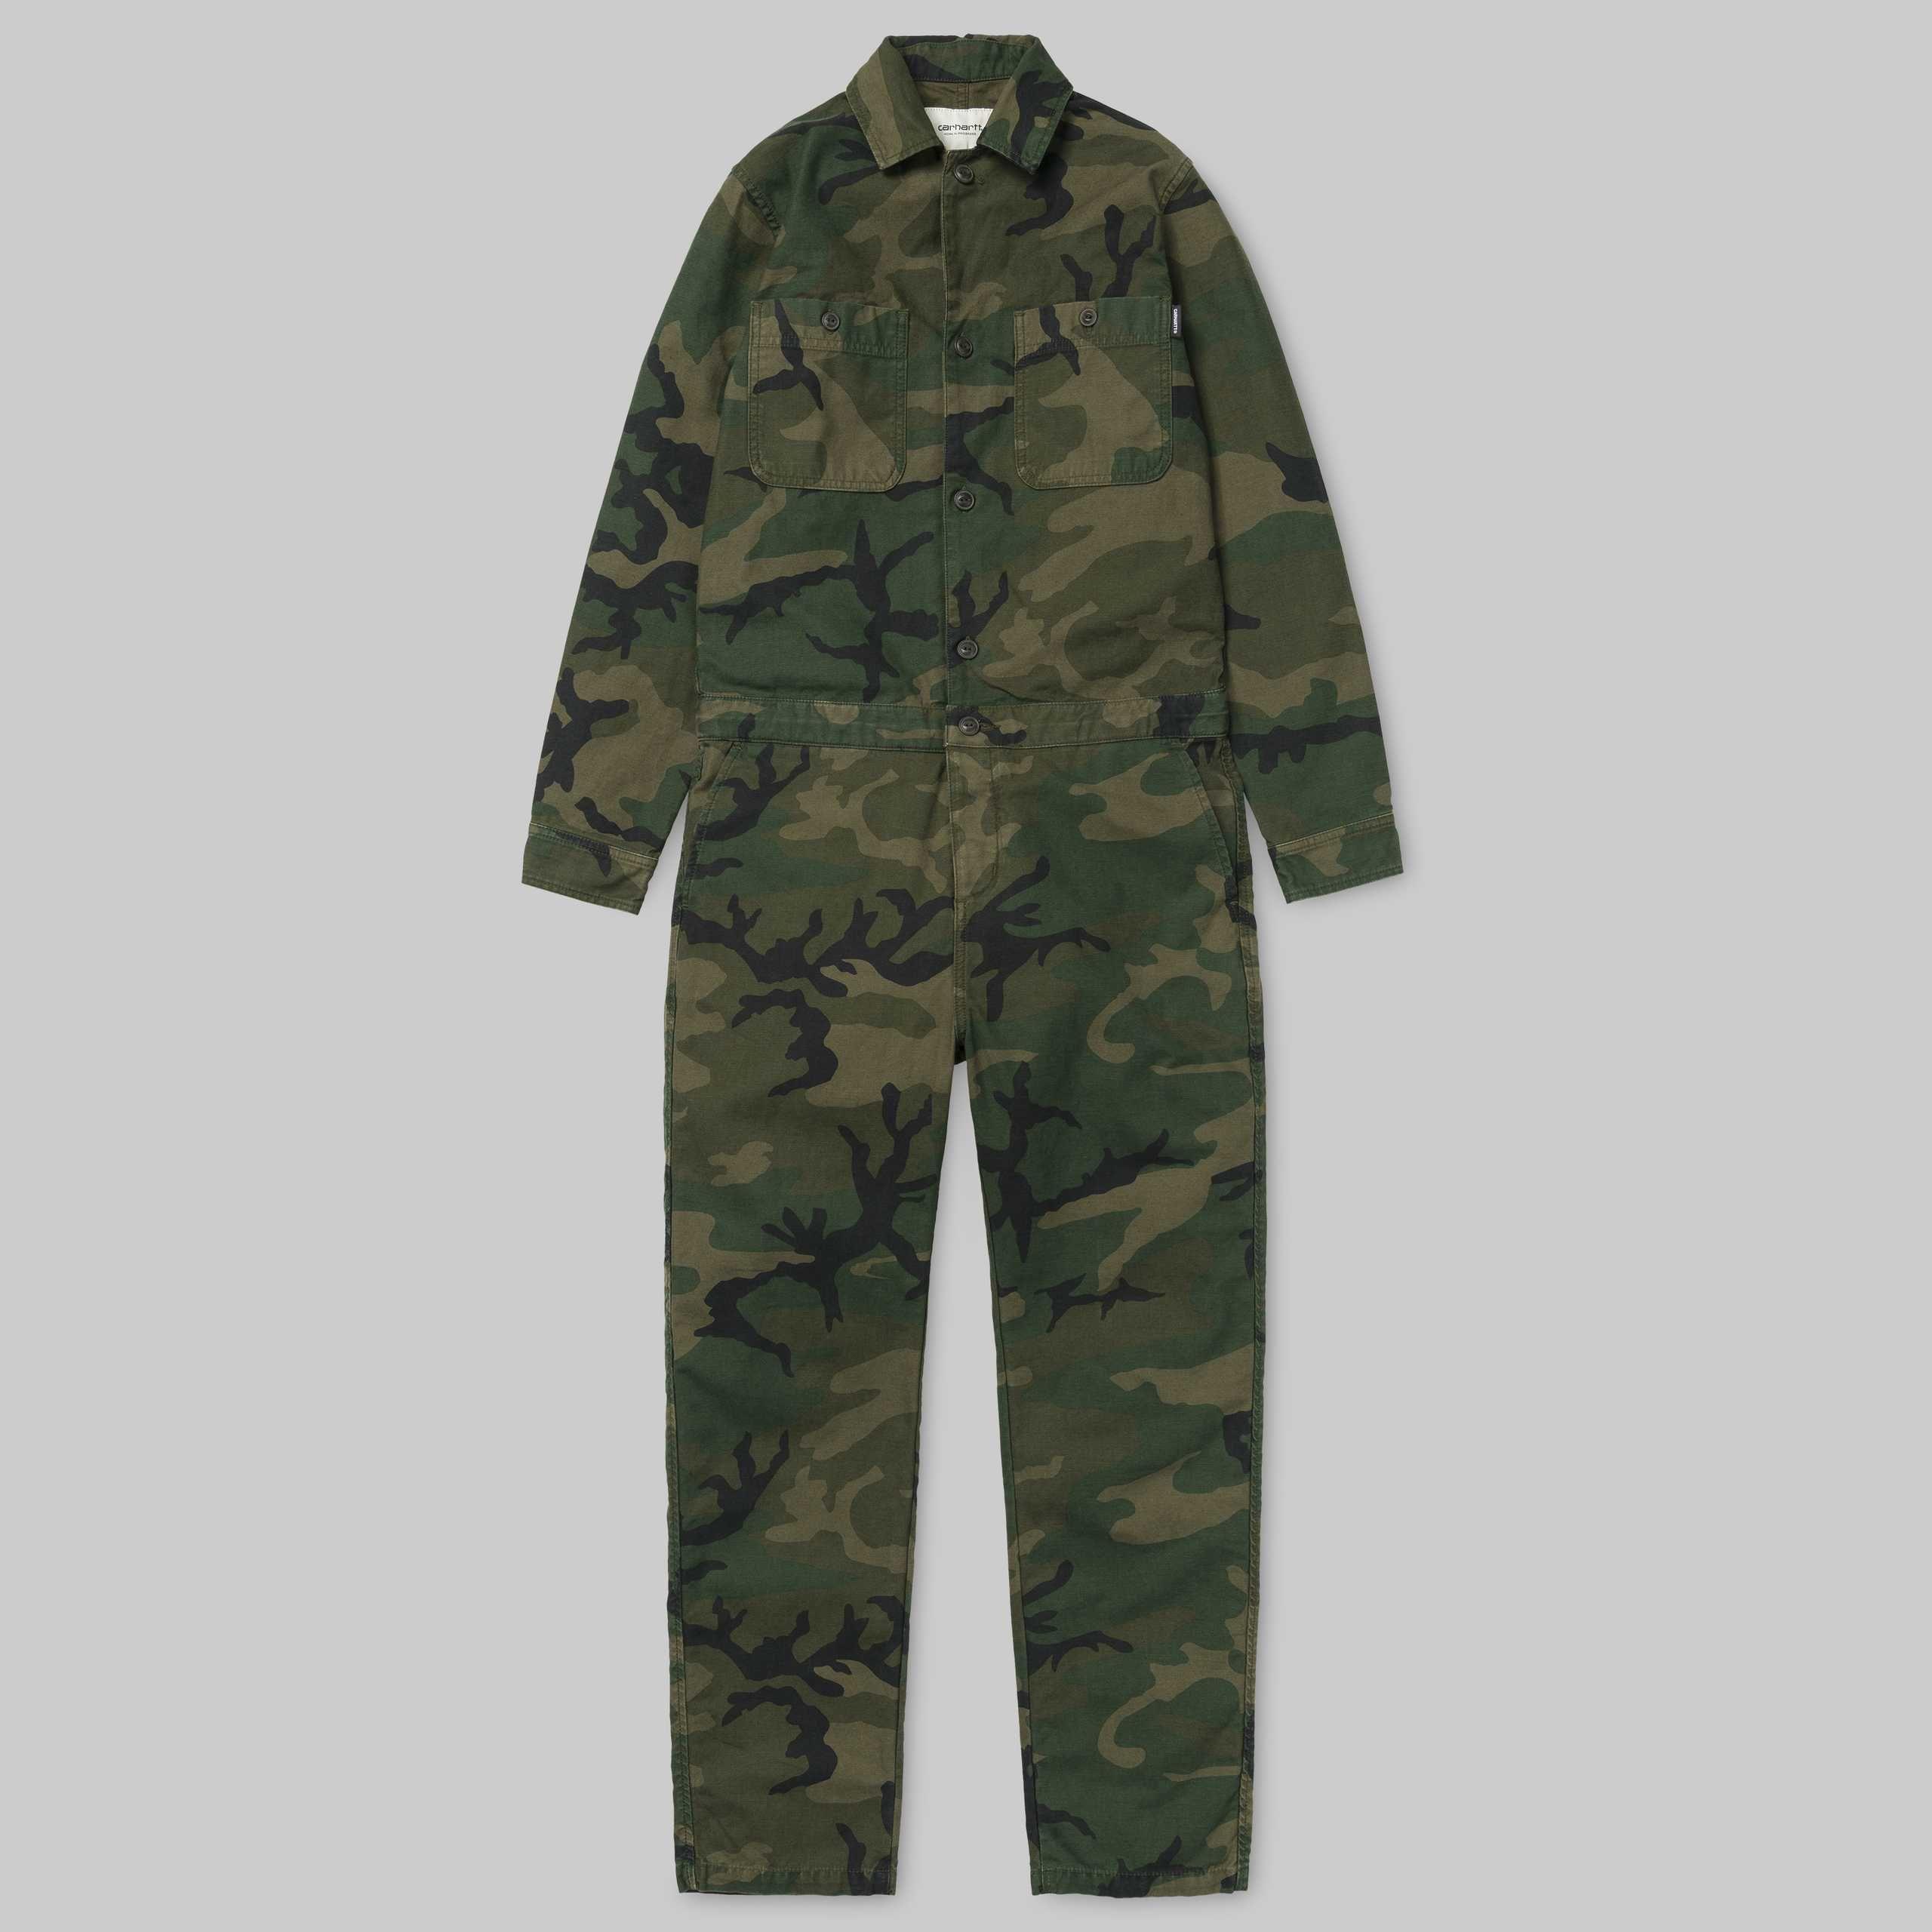 Carhartt jumpsuit